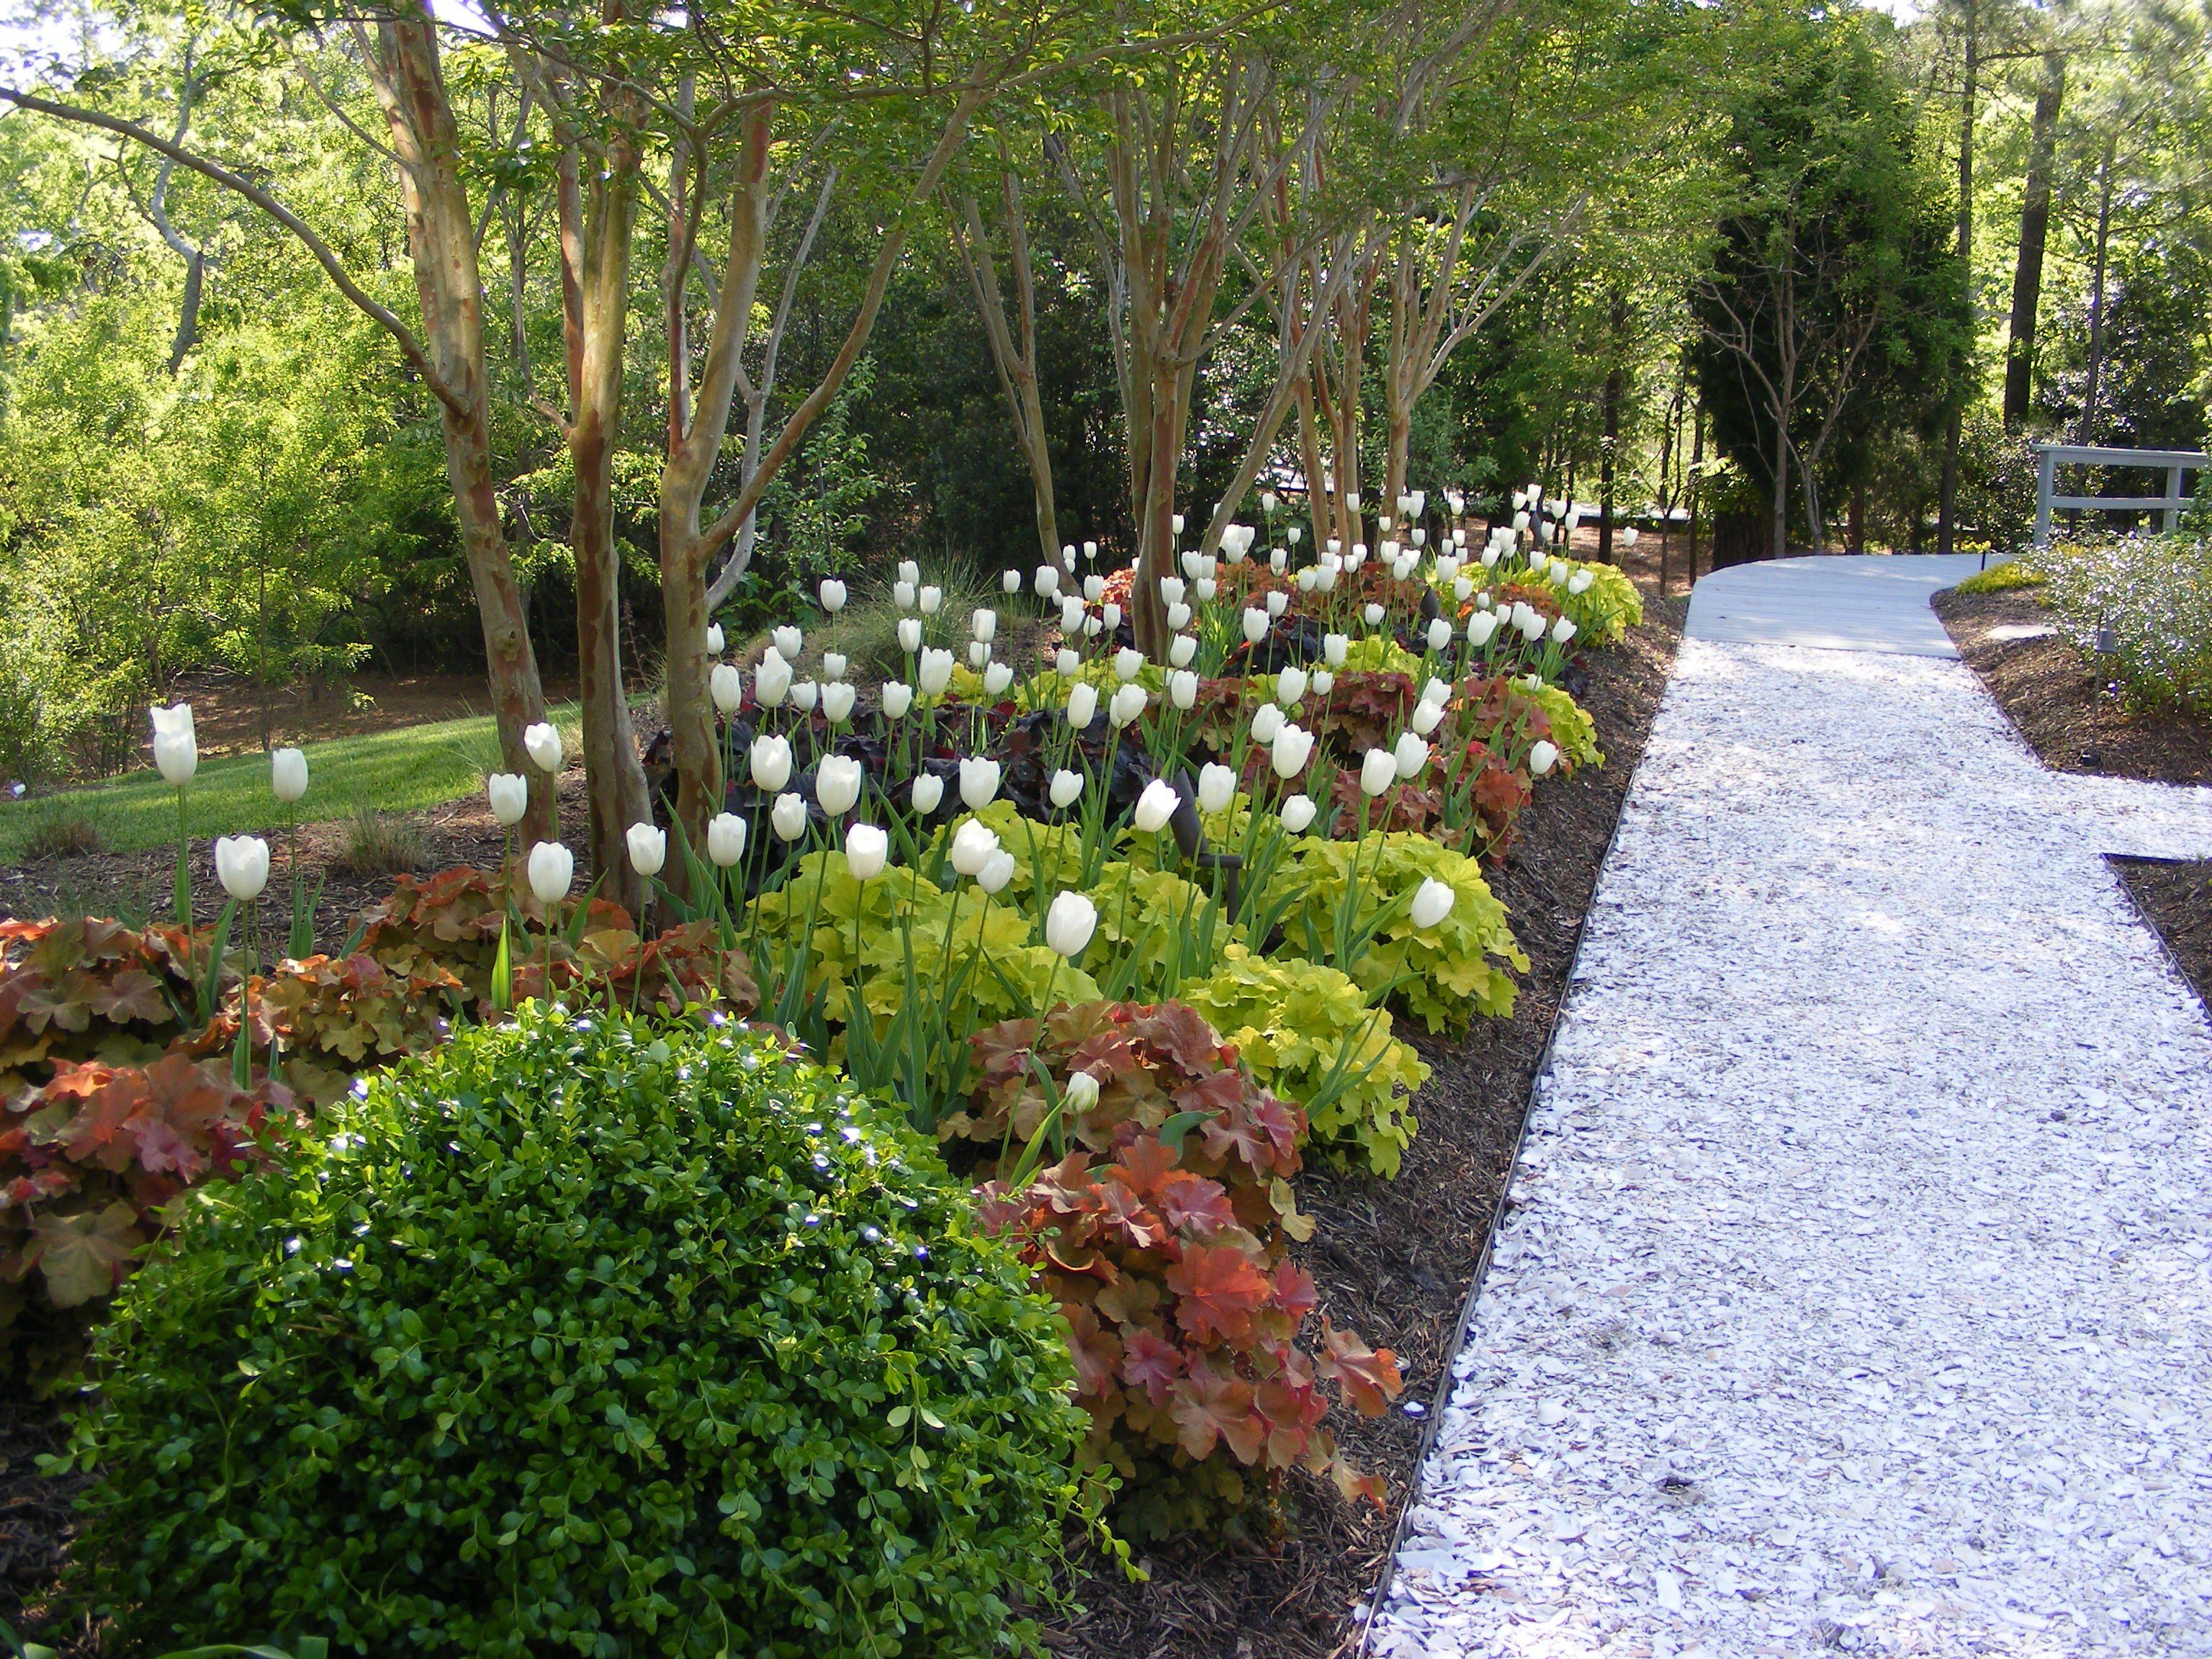 Creative environments landscape co edible gardens - Garden Path Created With Oyster Shells